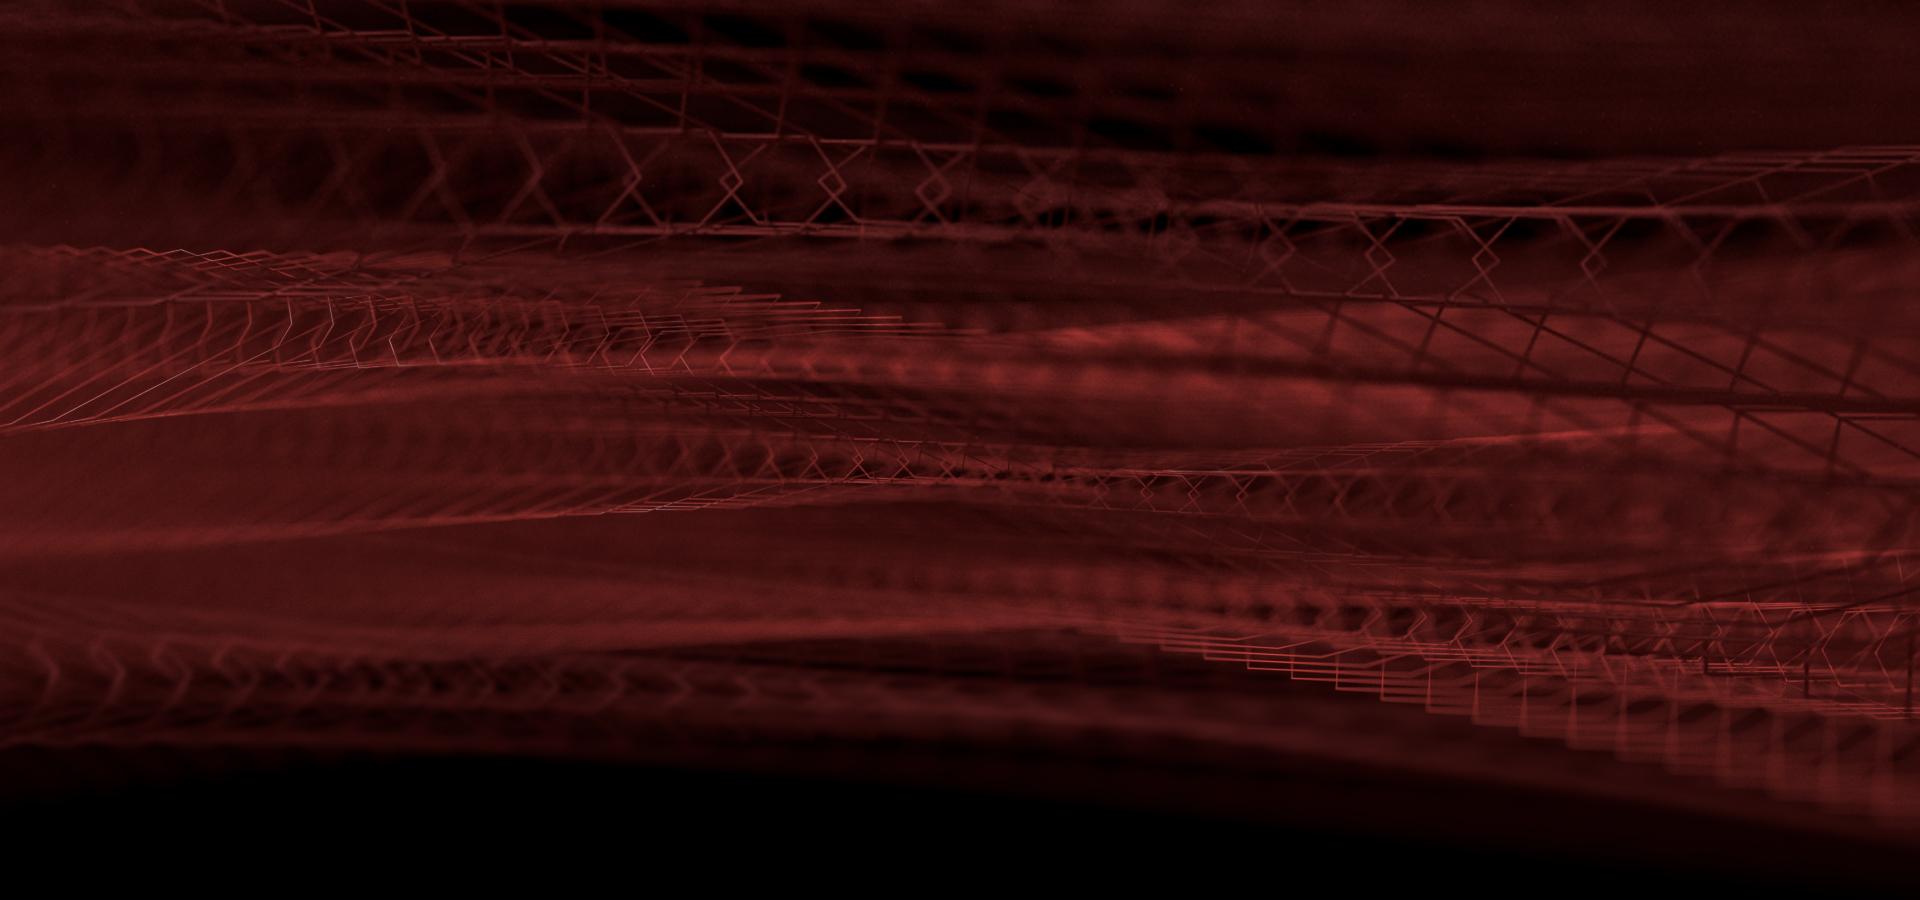 06-LEXUS-THREAD-02-2.jpg